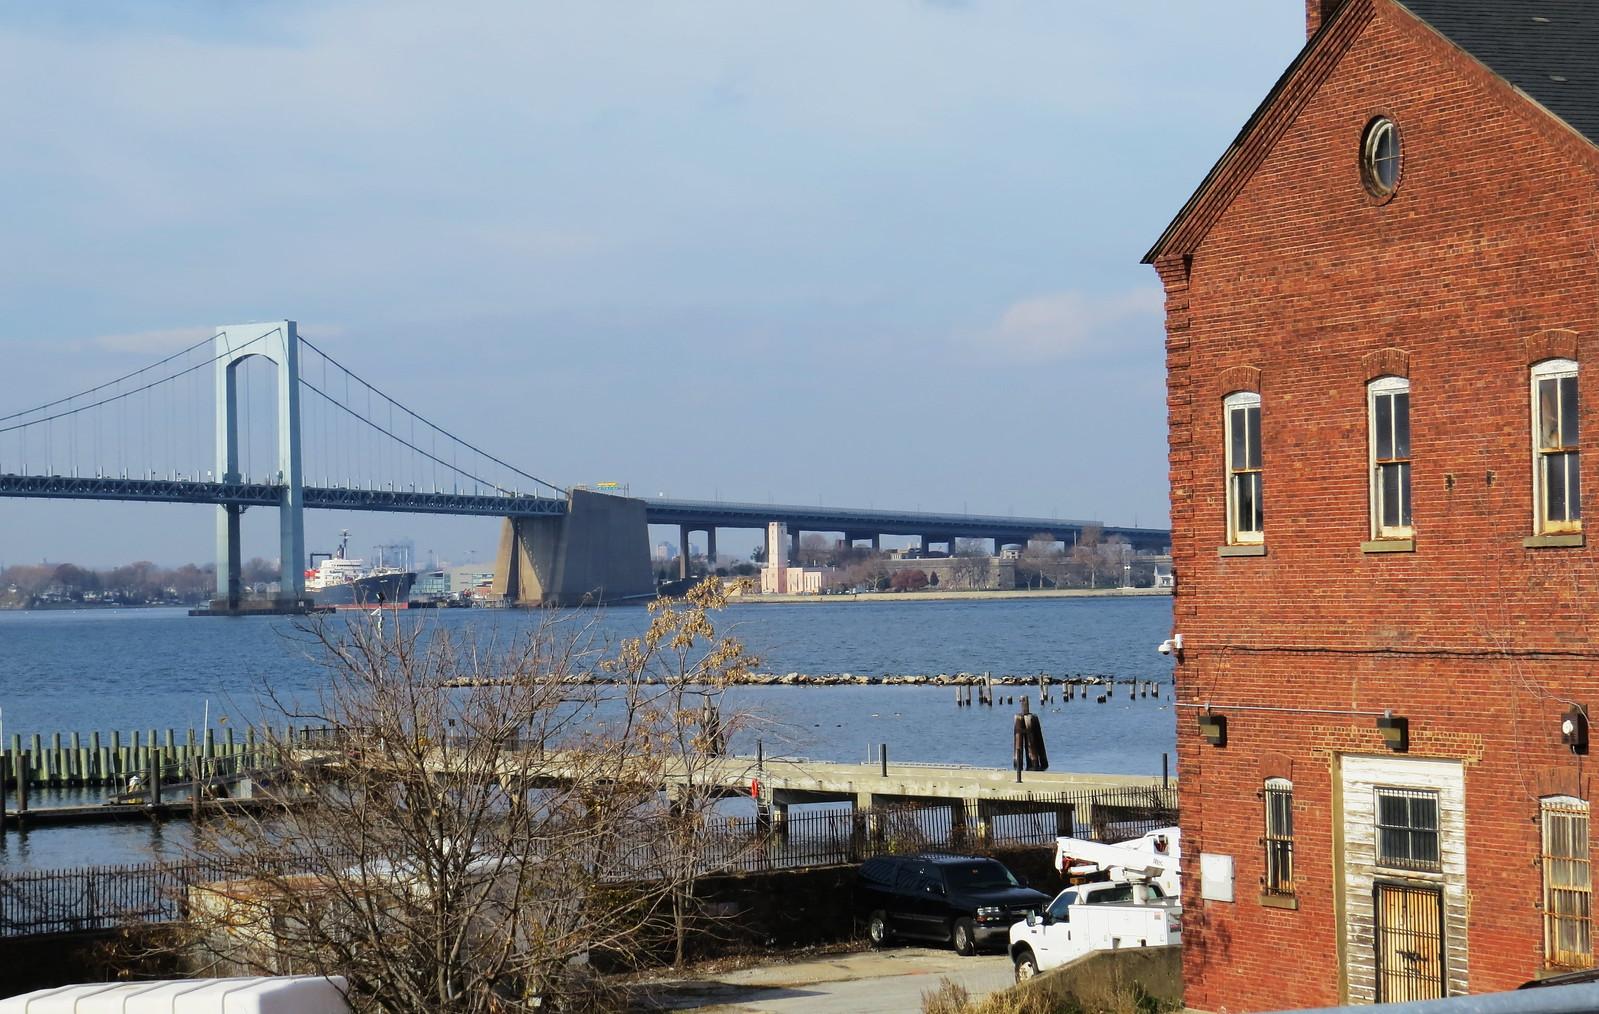 Fort Totten, NY